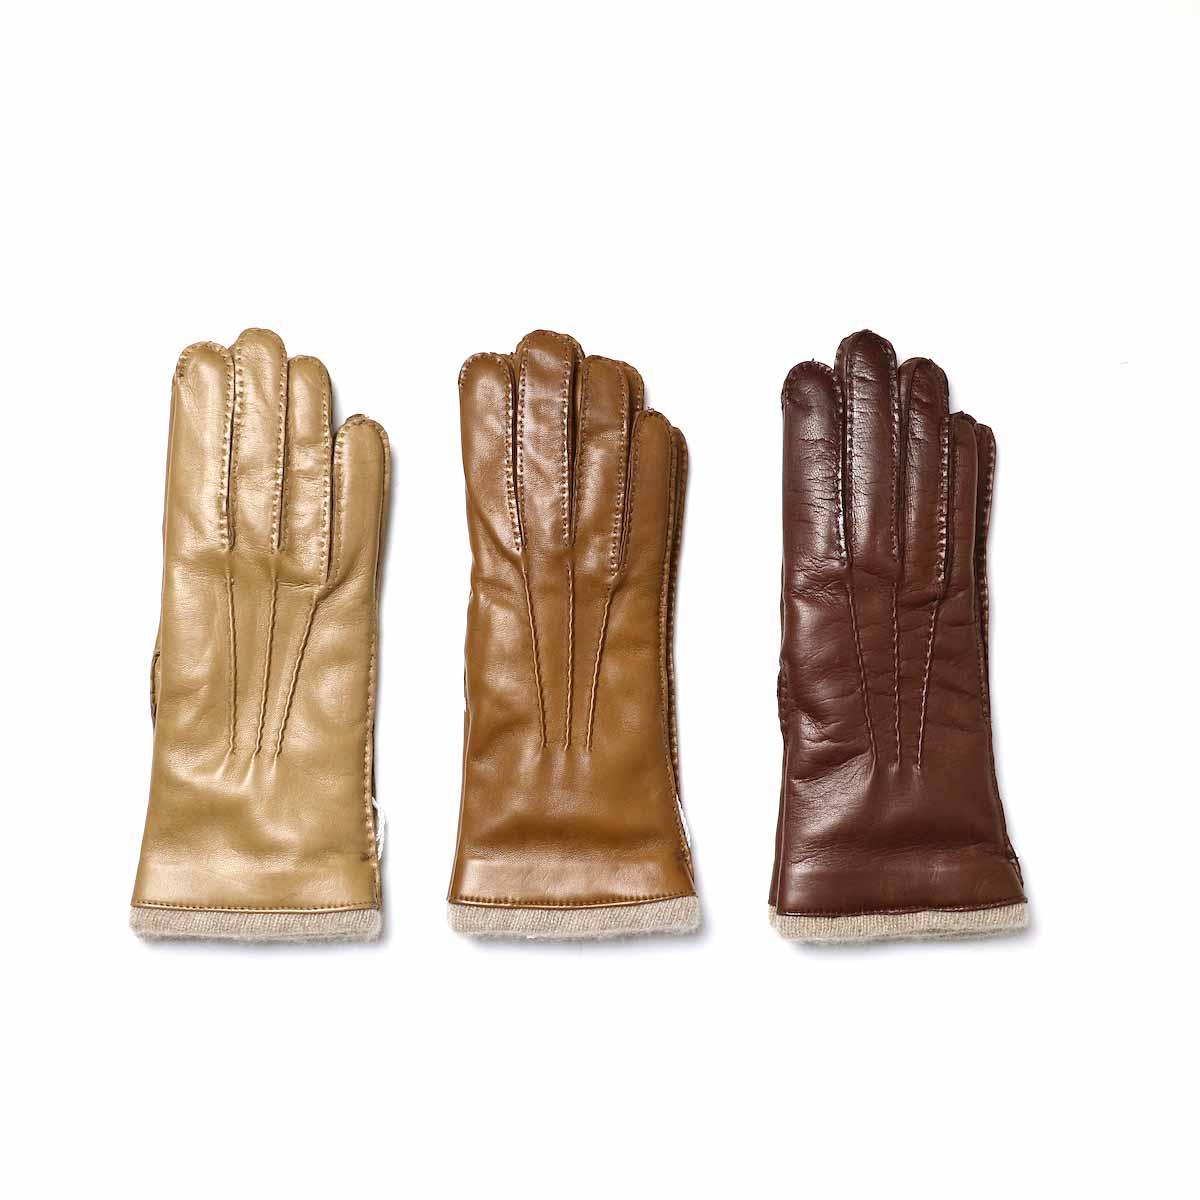 Italguanto / Leather Glove 左からBeige・Camel・Brown